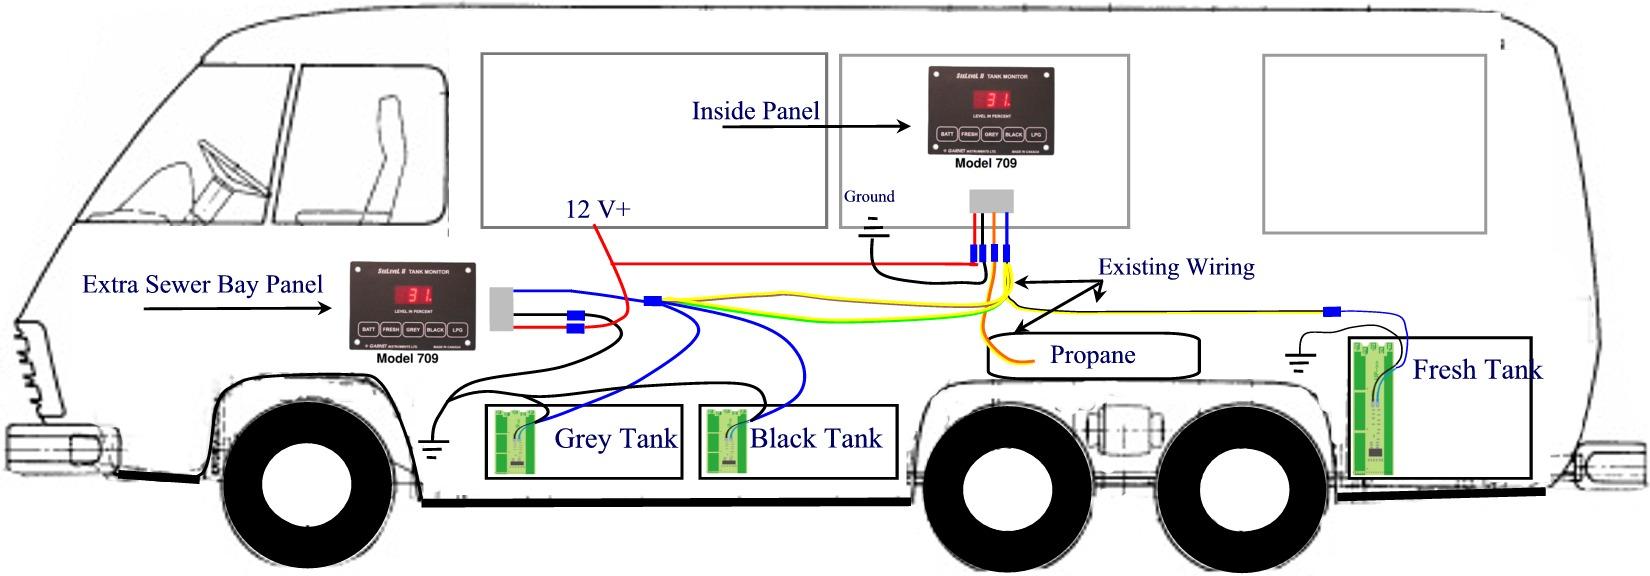 shurflo rv water pump wiring diagram electronic number lock circuit 22 perfect camper trailer setup | fakrub.com